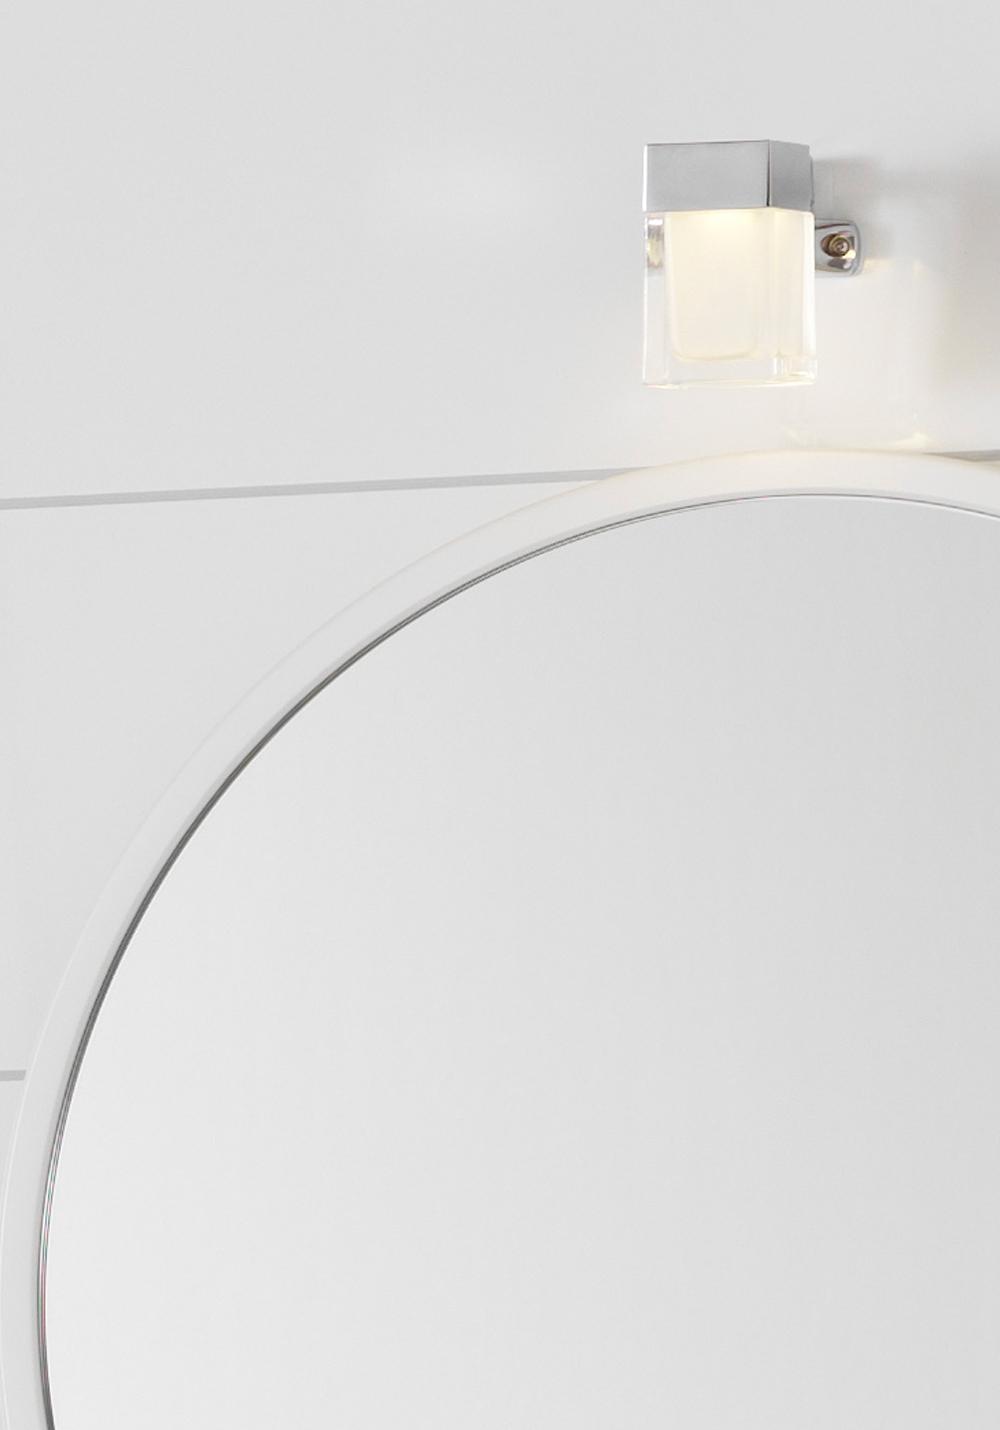 Hafa Eden LED-lampa badrum - Hafa badrum